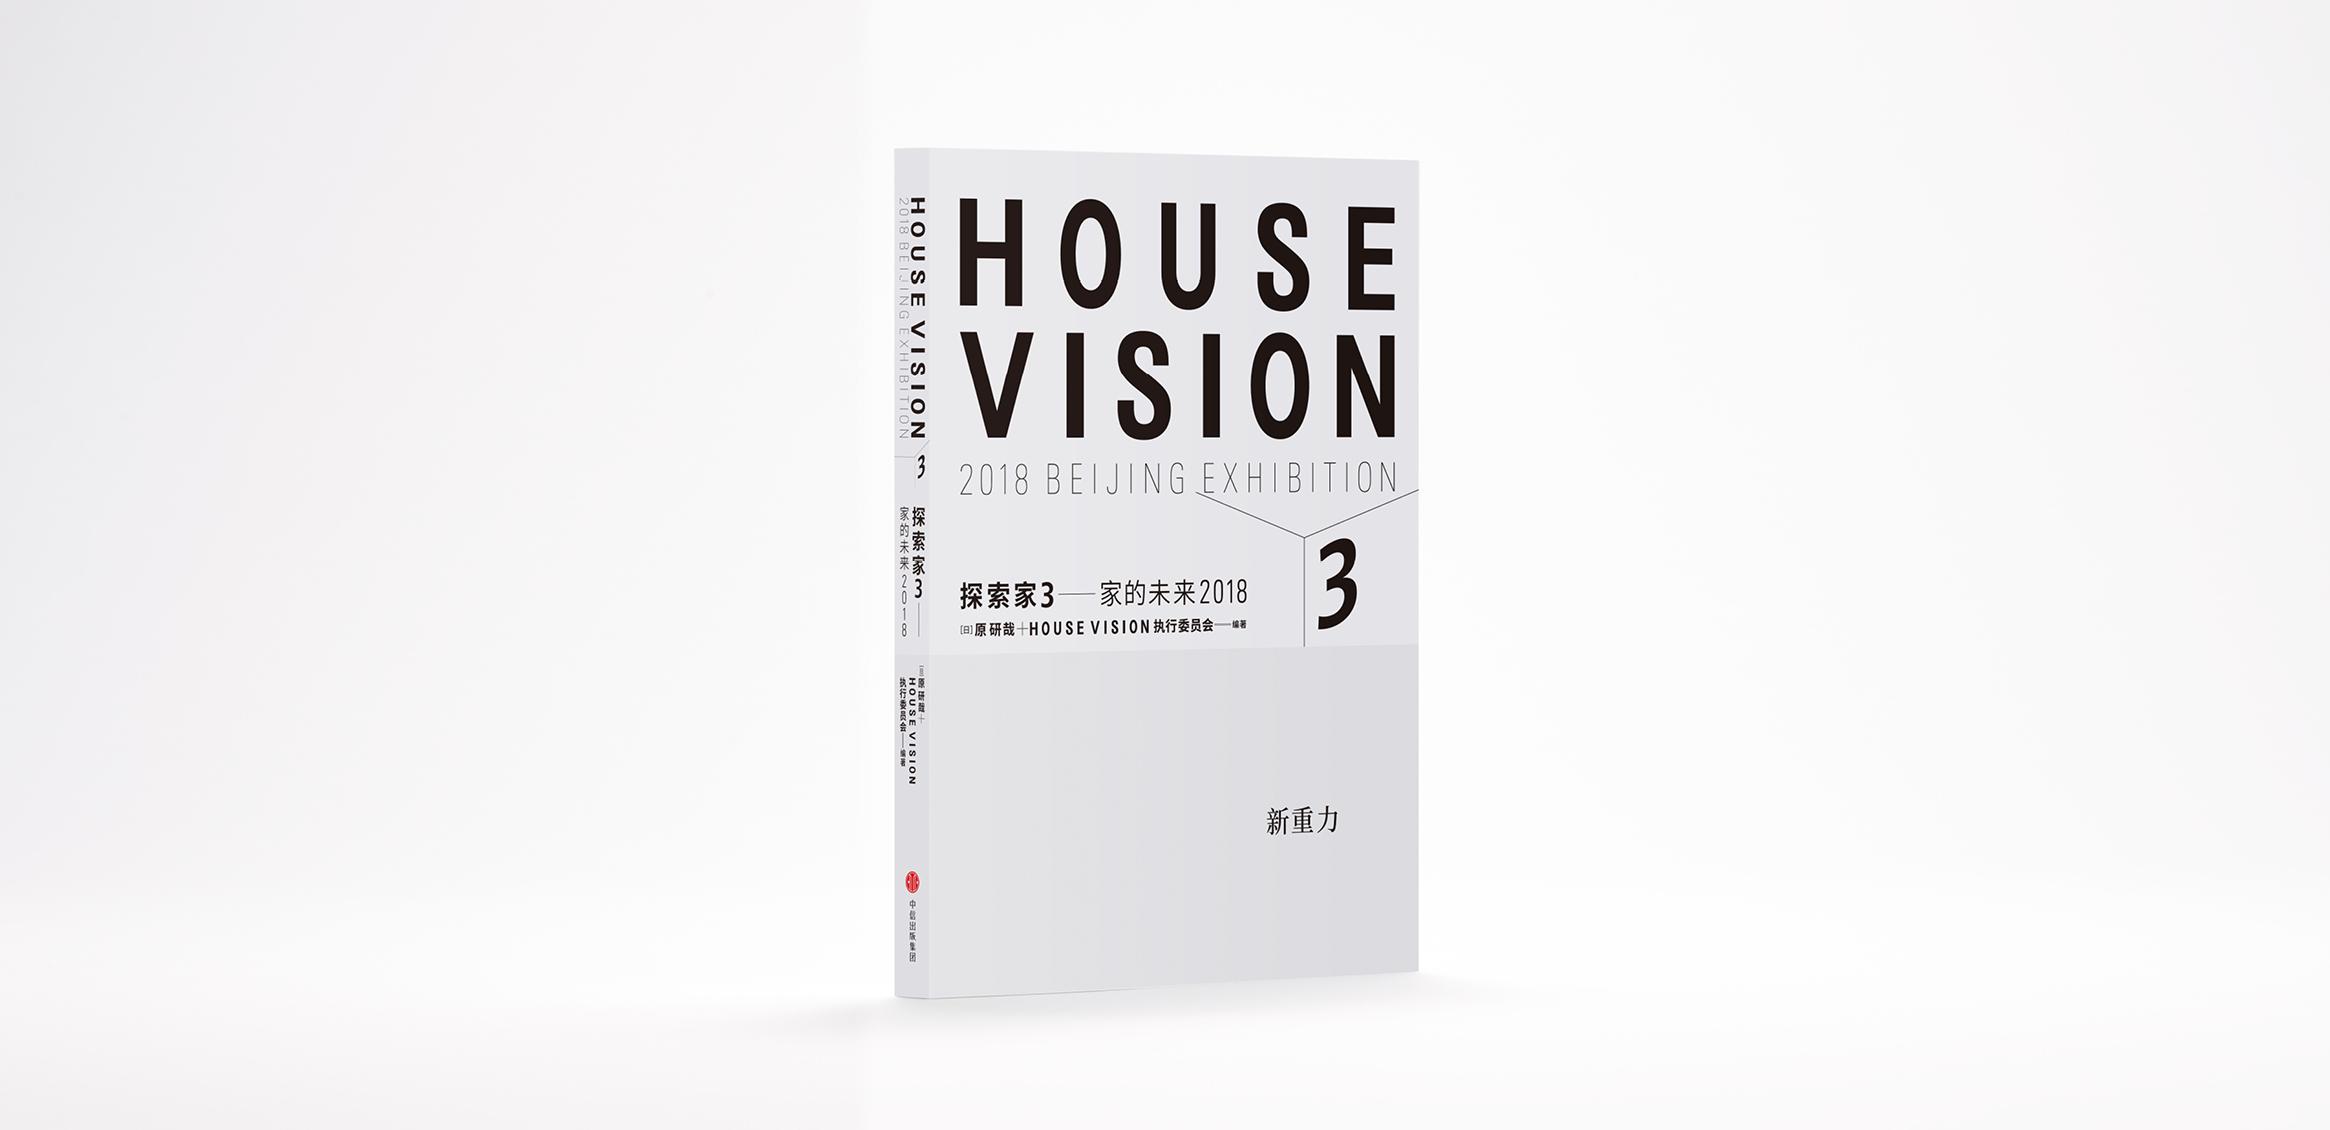 HOUSE VISION 2018 BEIJING EXHIBITION展覧会書籍0枚目